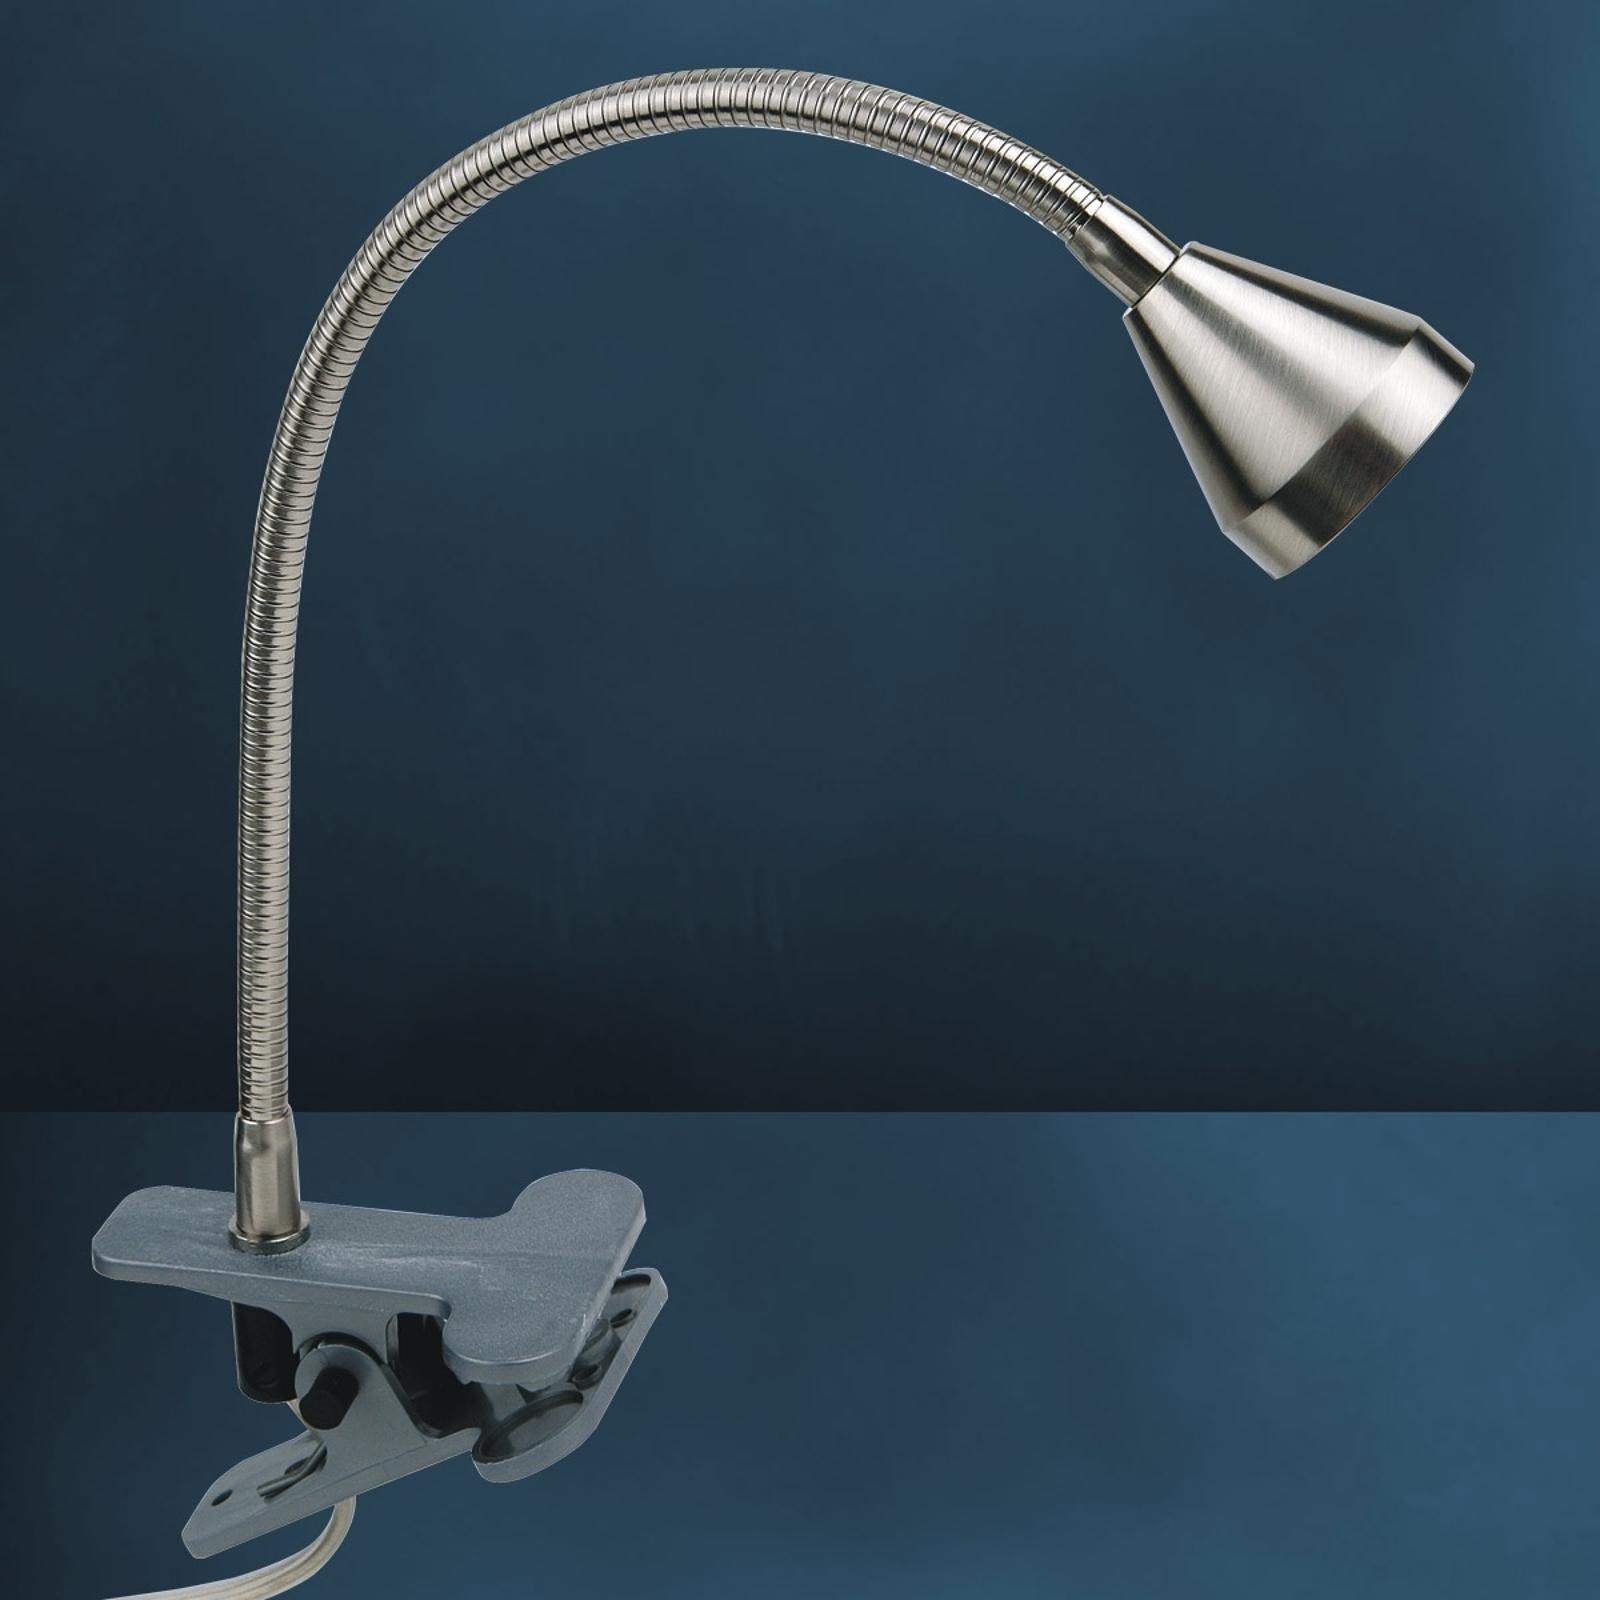 Funktionell LED-klämlampa MINI universalvitt ljus